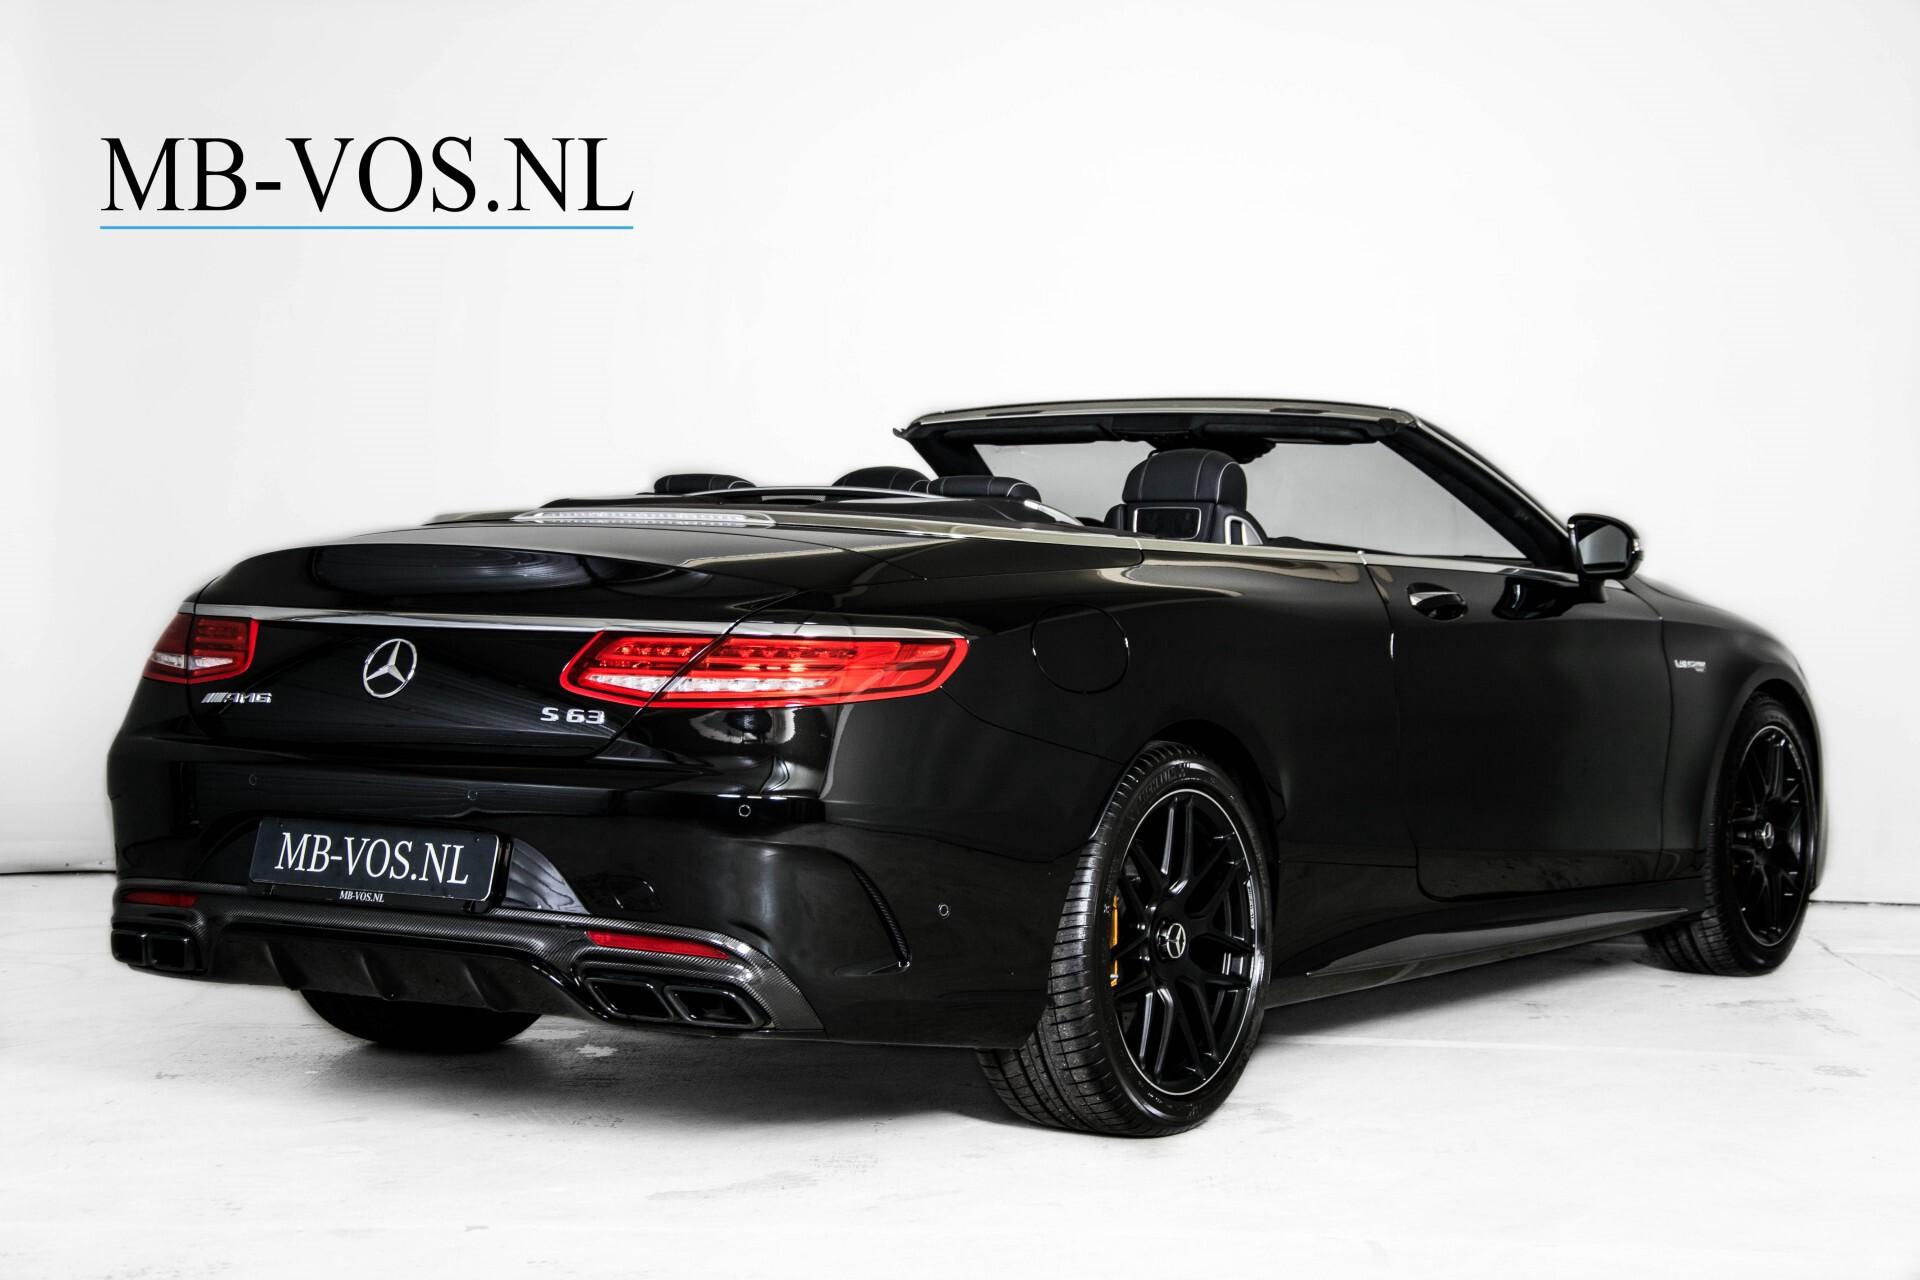 Mercedes-Benz S-Klasse Cabrio 63 AMG 4-M Ceramic/Designo/Carbon/Burmester High End Aut Foto 2